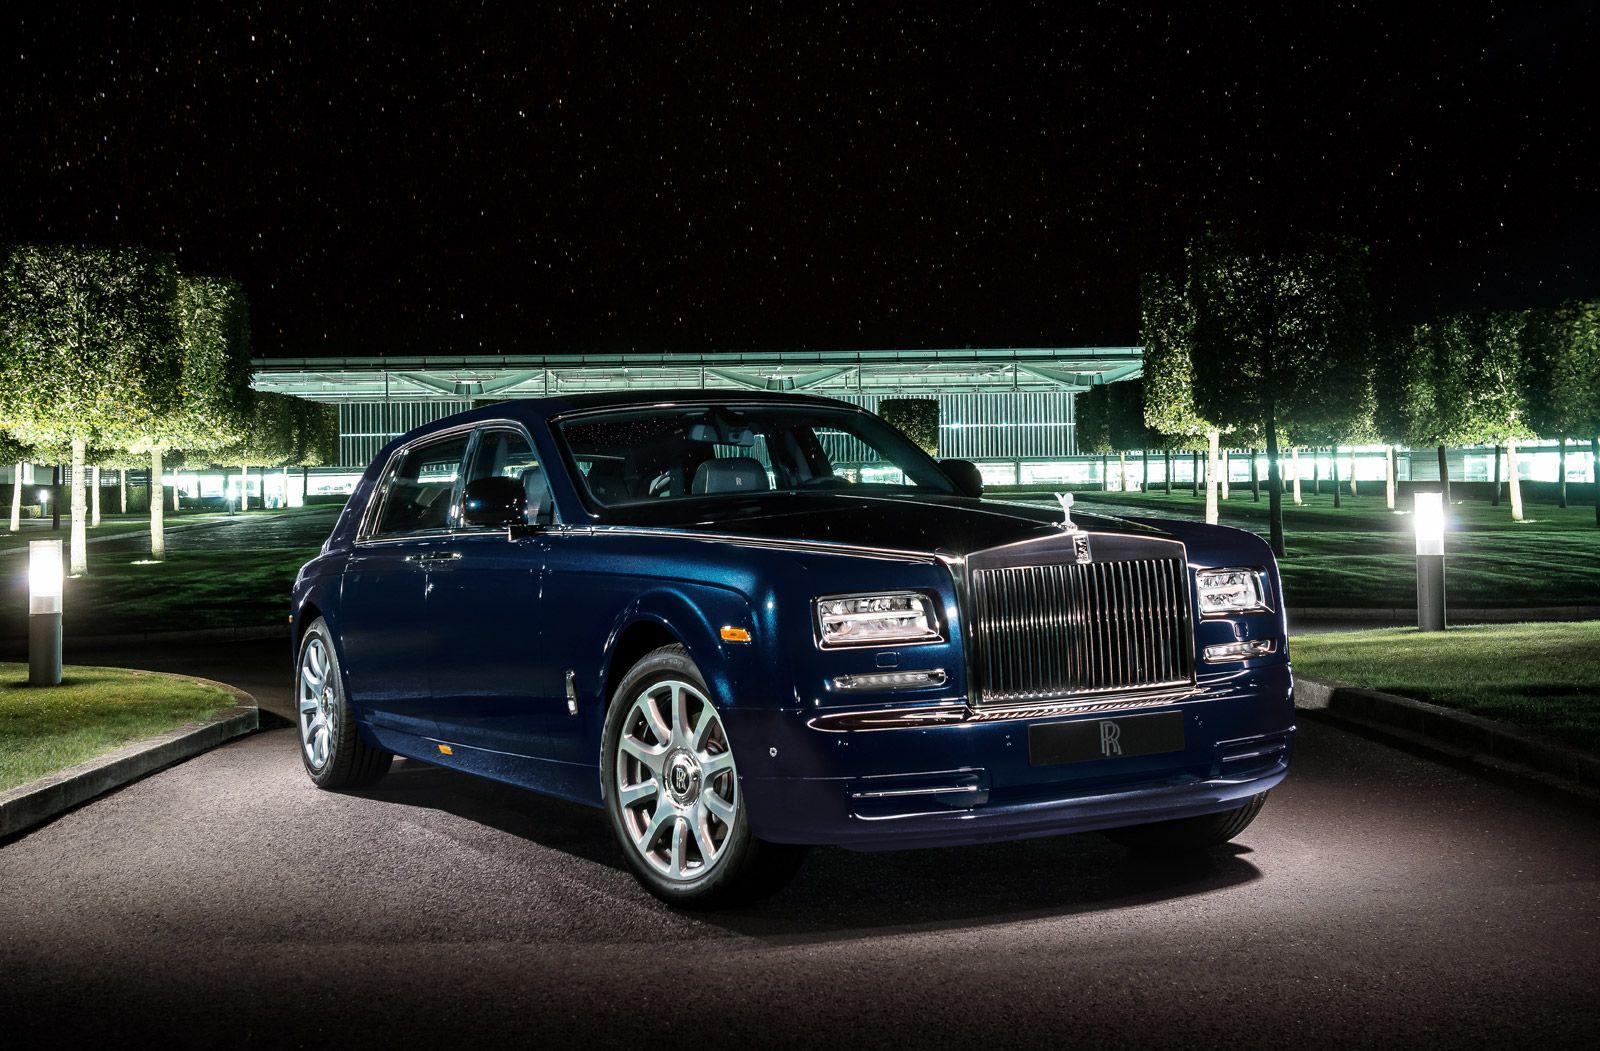 Rolls Royce Phantom 2015 Hd Wallpaper 08 Automobile Pinterest